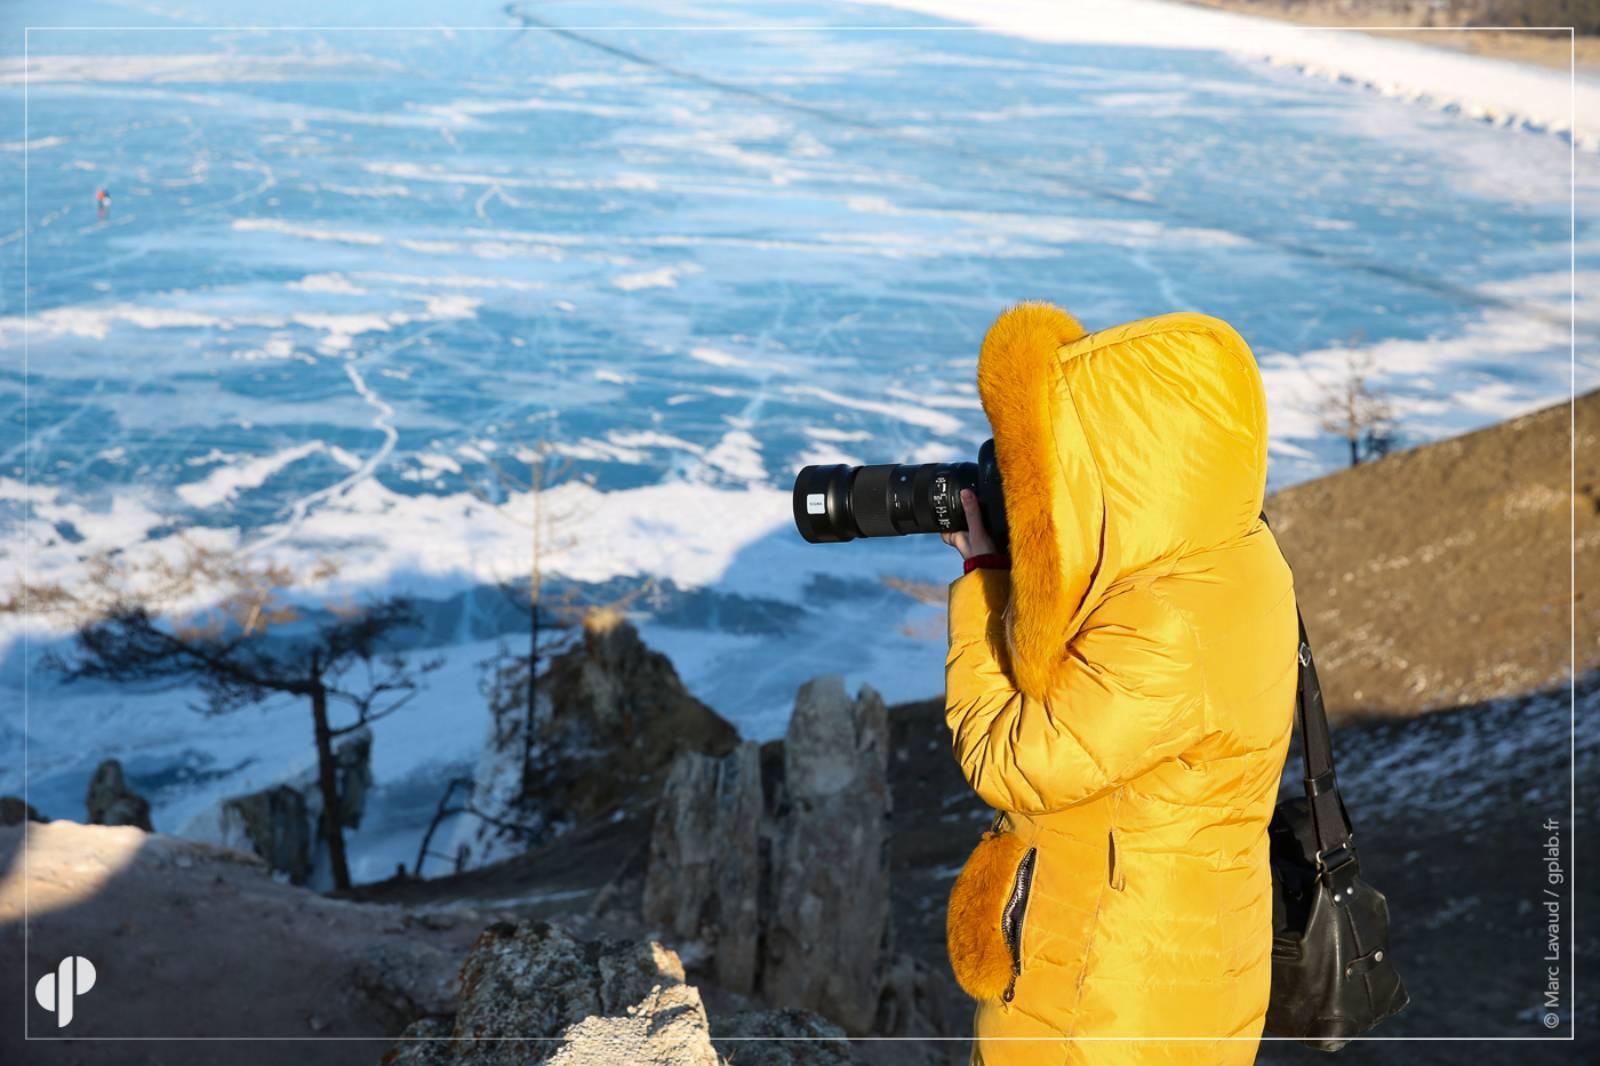 la photographe Natalya Saprunova avec un objectif sigma sur Canon